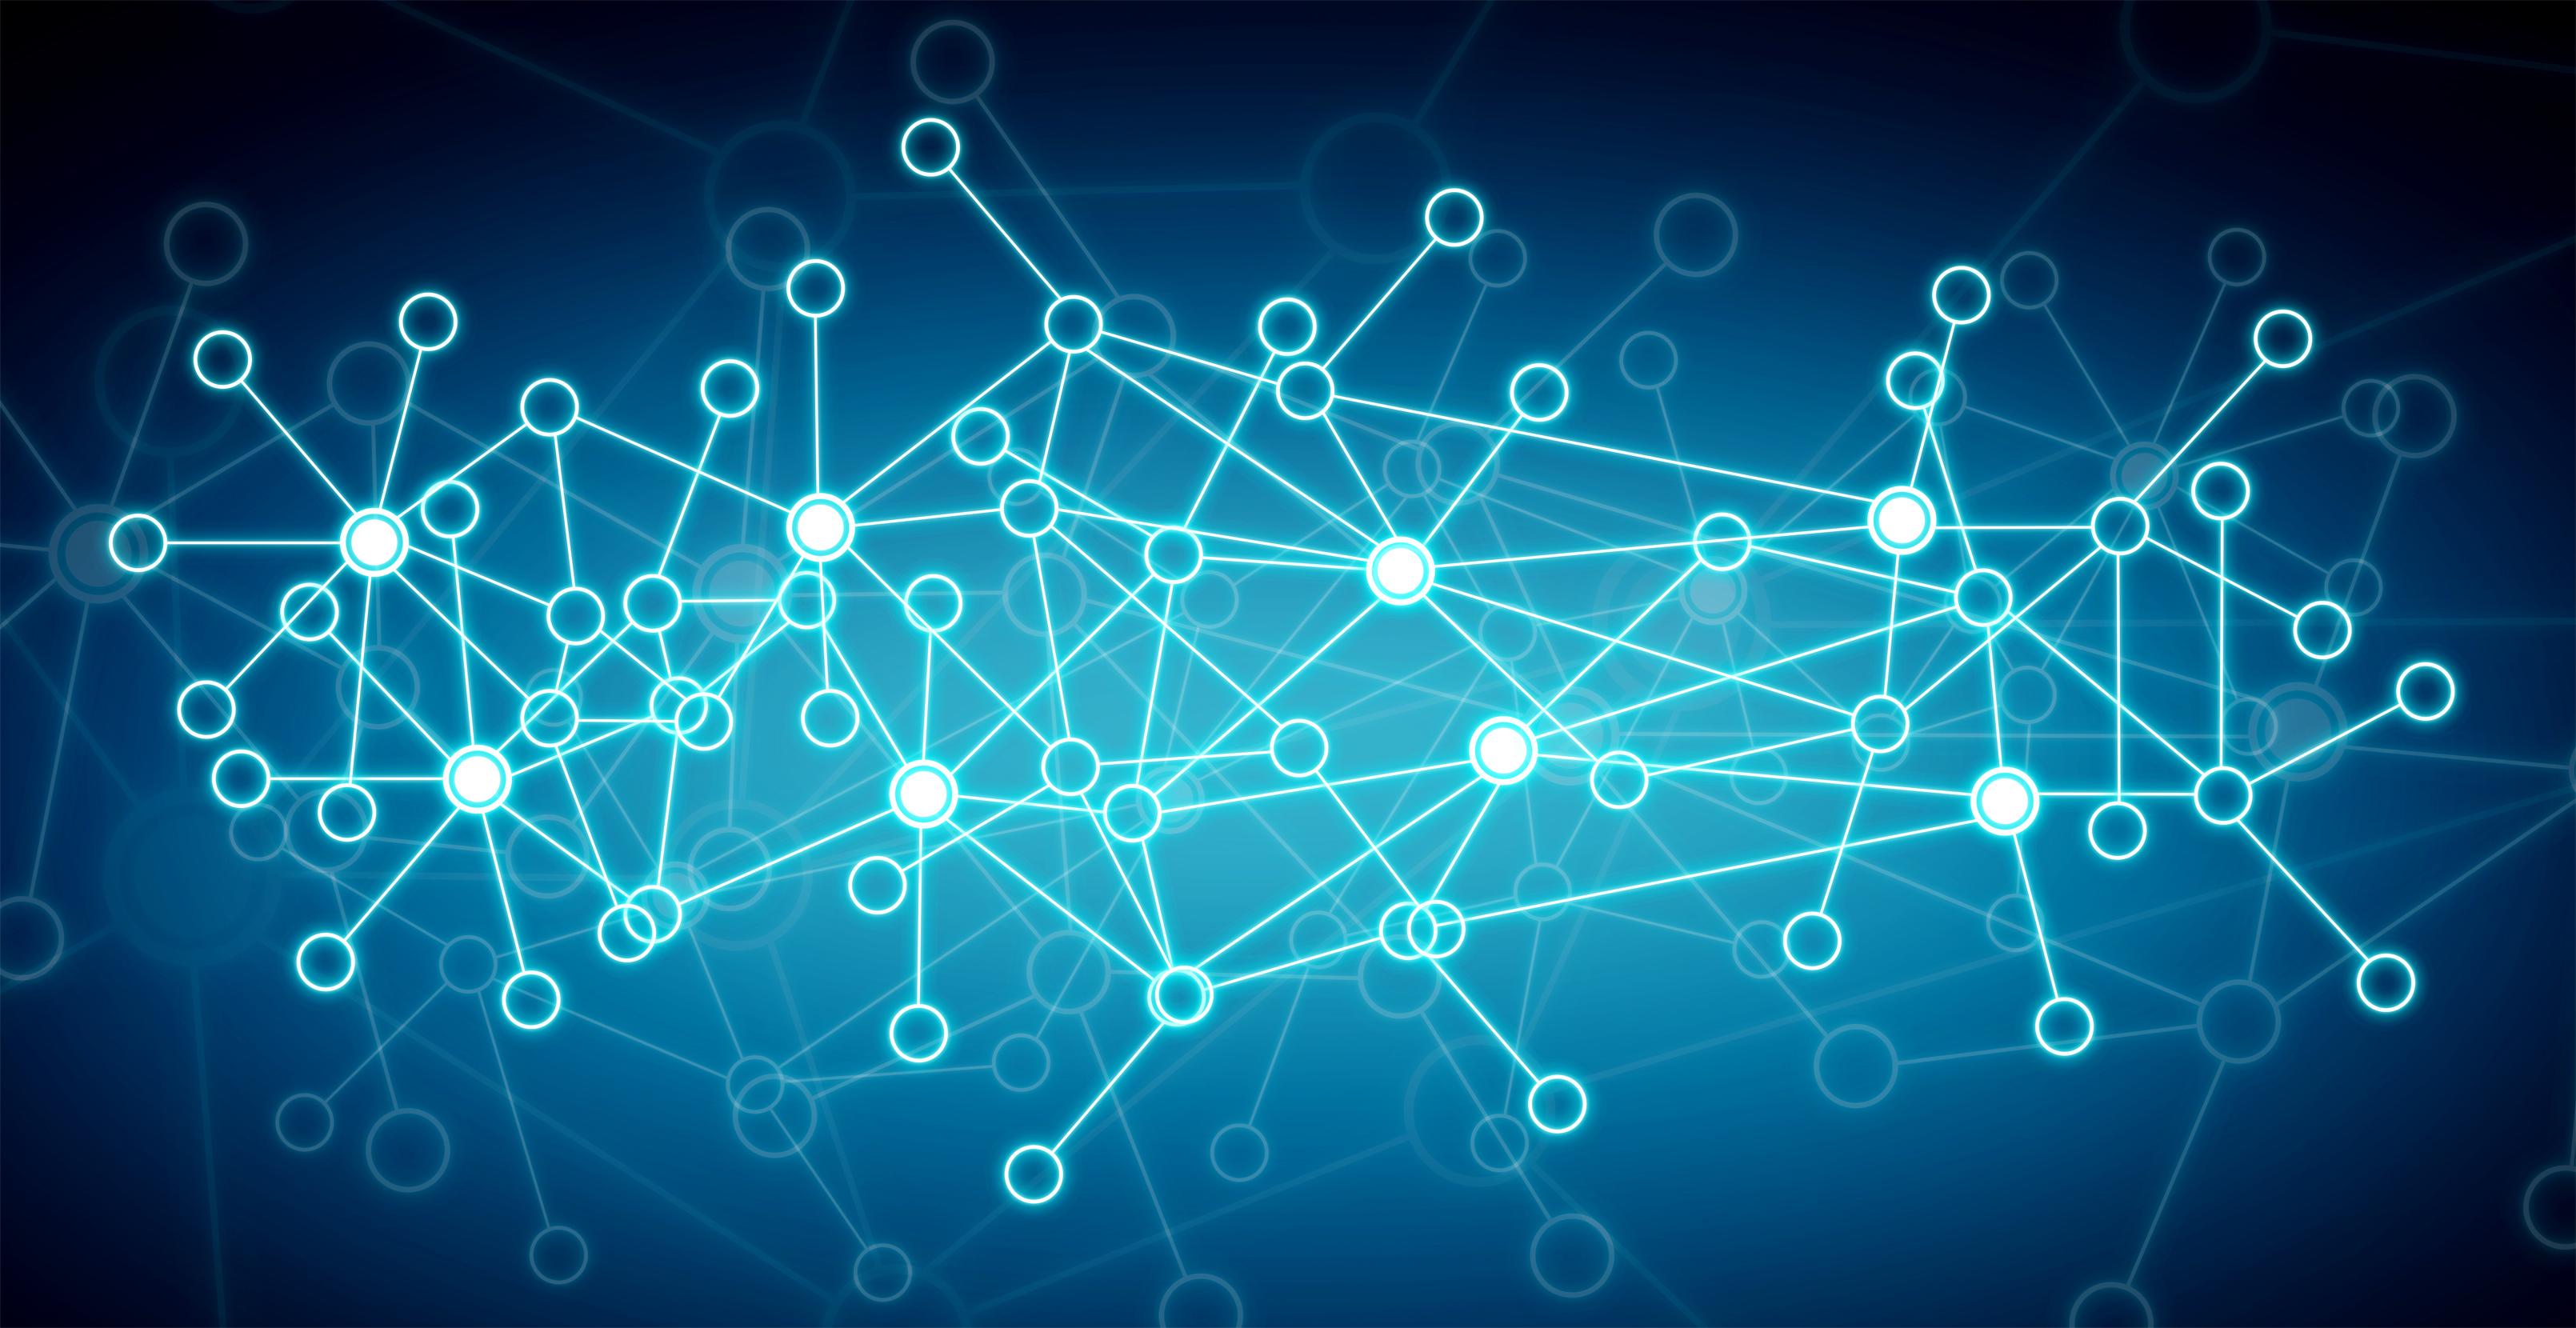 Mesh - A Network of Relations Between Entities, 3d, Media, Net, Nebula, HQ Photo